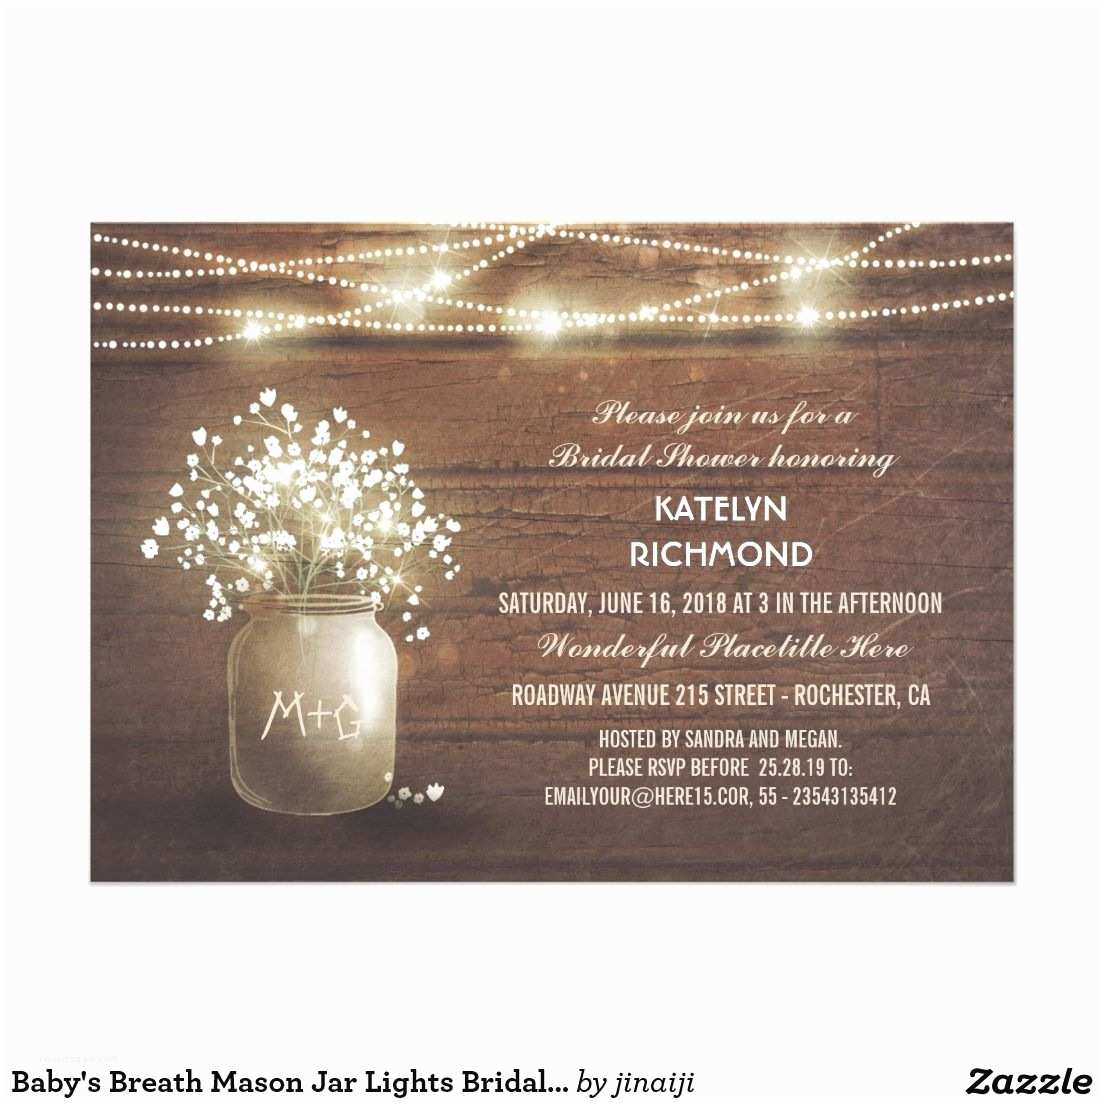 Rustic Bridal Shower Invitations Lovely Bridal Shower Invitation Features Bright String